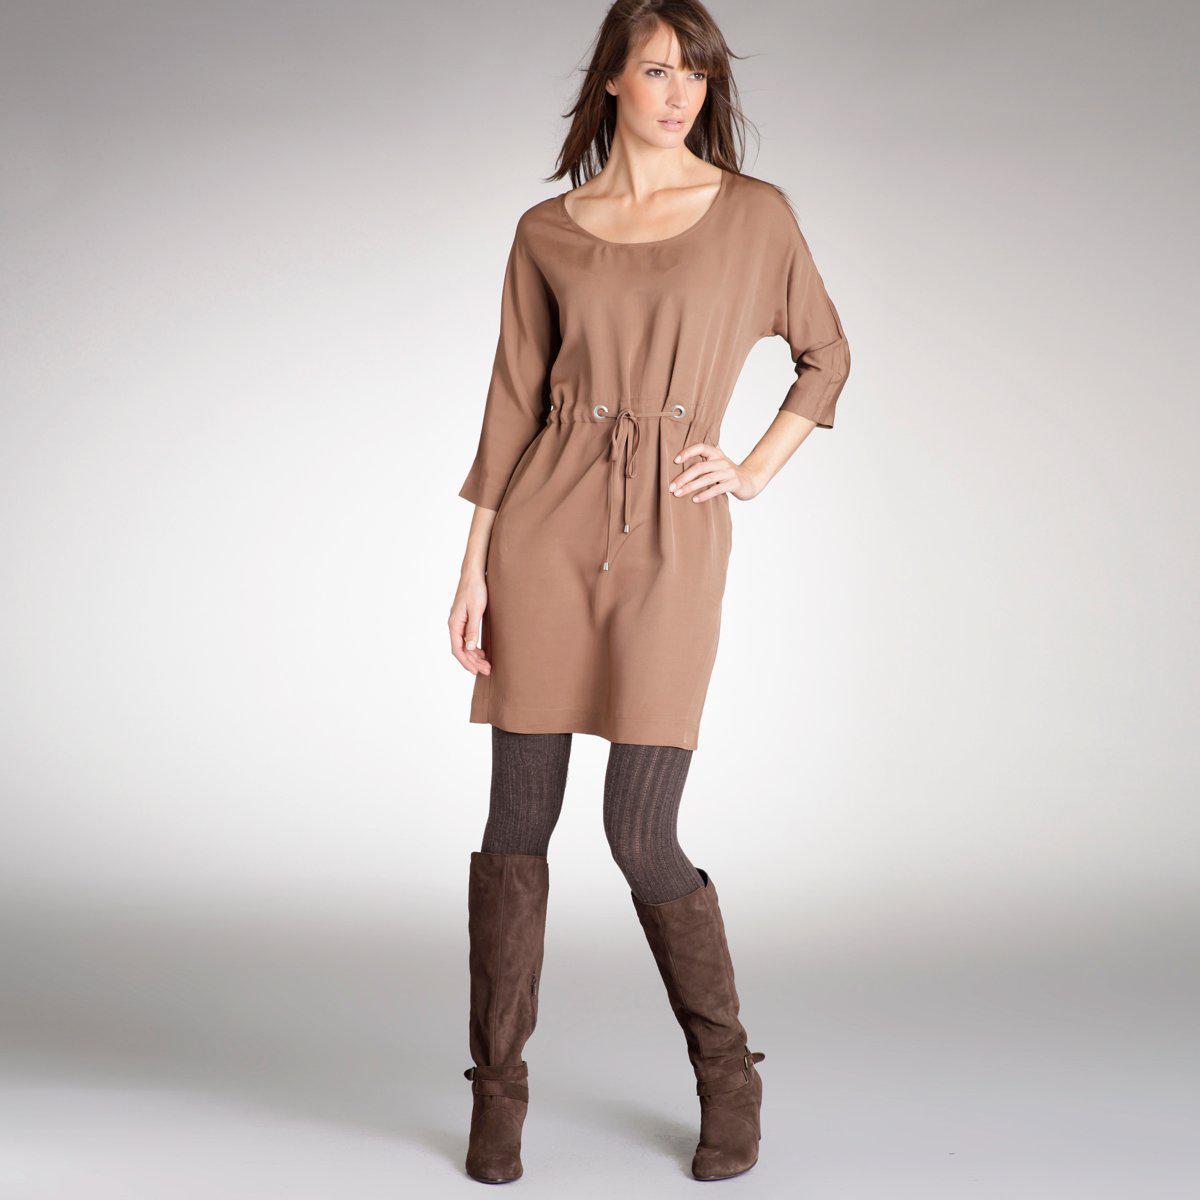 ae54c36de151 Βραδυνα Φορεματα LaRedoute Φθινόπωρο 2011 Κωδ. 324264606